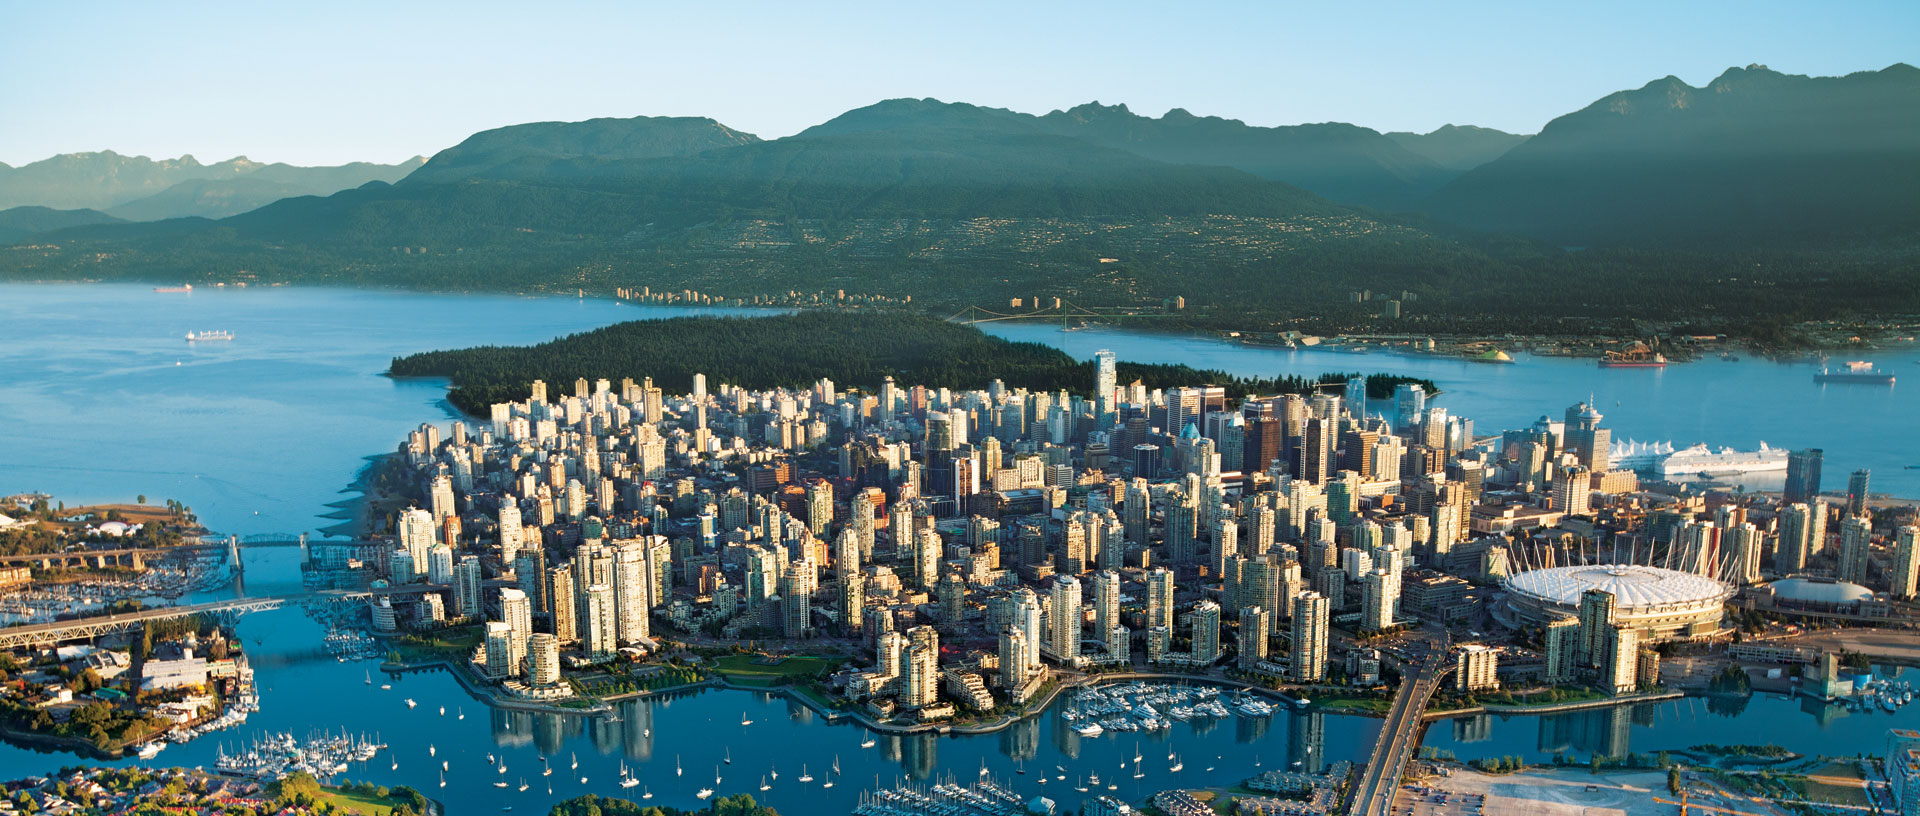 Tourism-Vancouver-Aerial-Albert-Normandin-2011